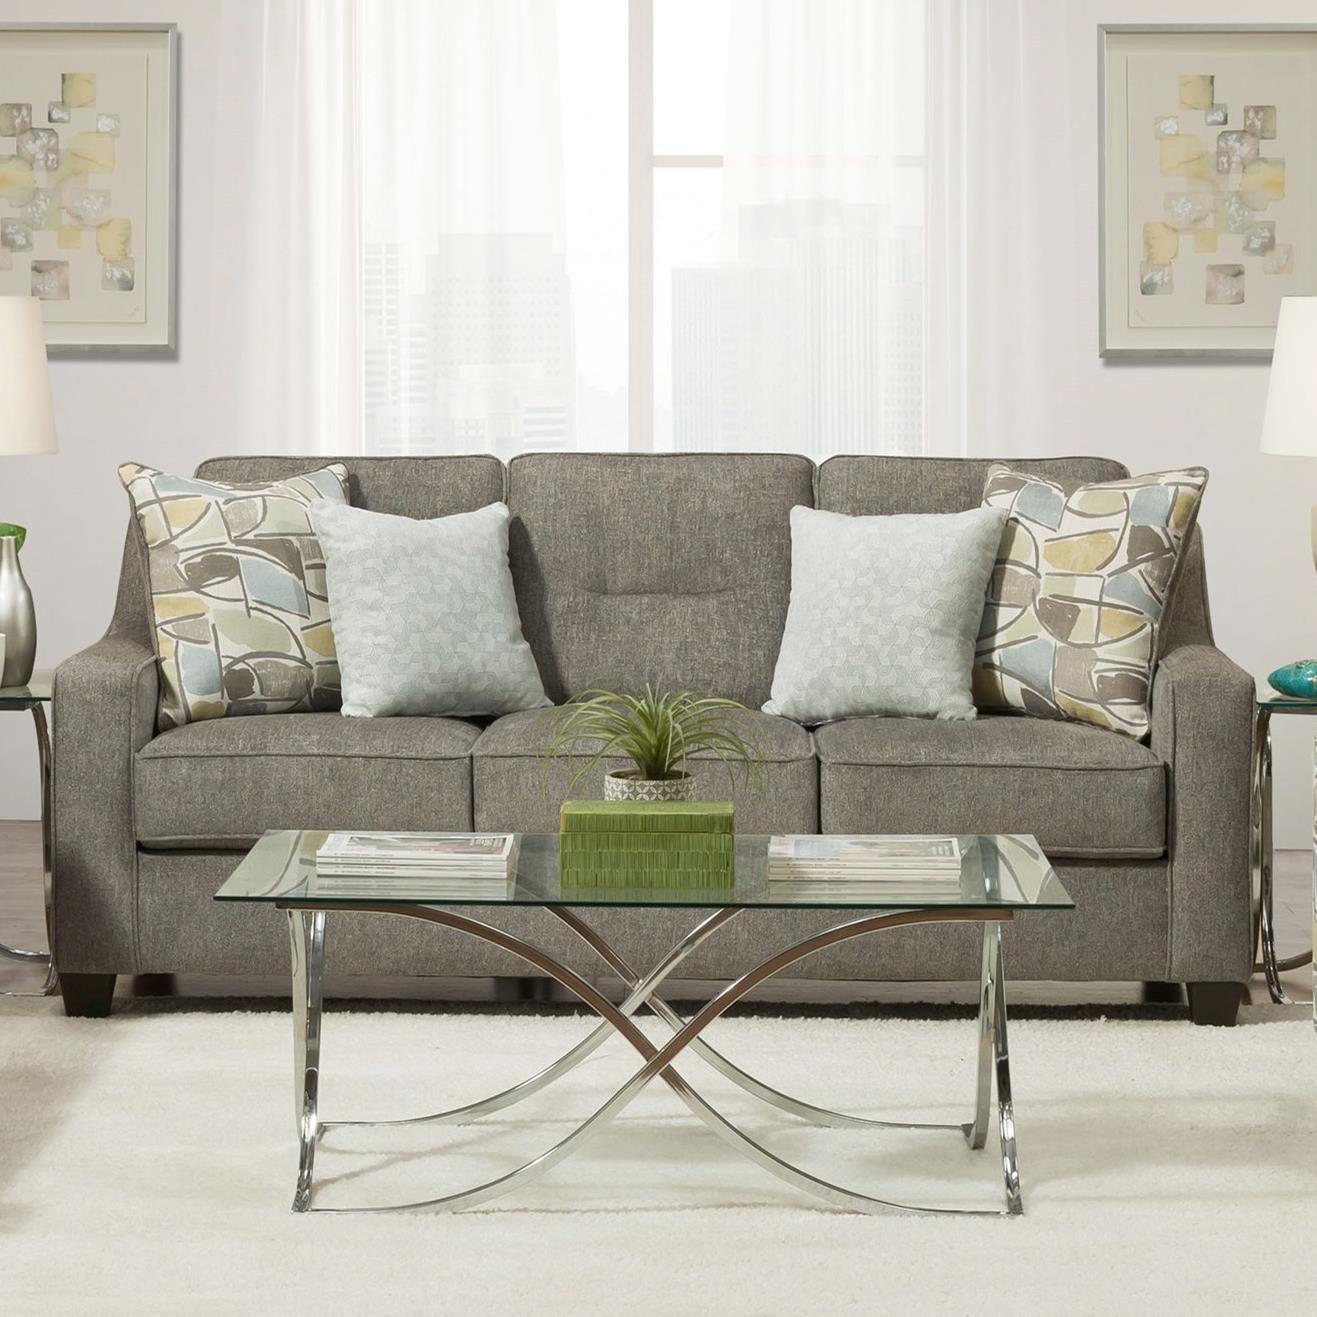 3450 Sofa by Peak Living at Prime Brothers Furniture